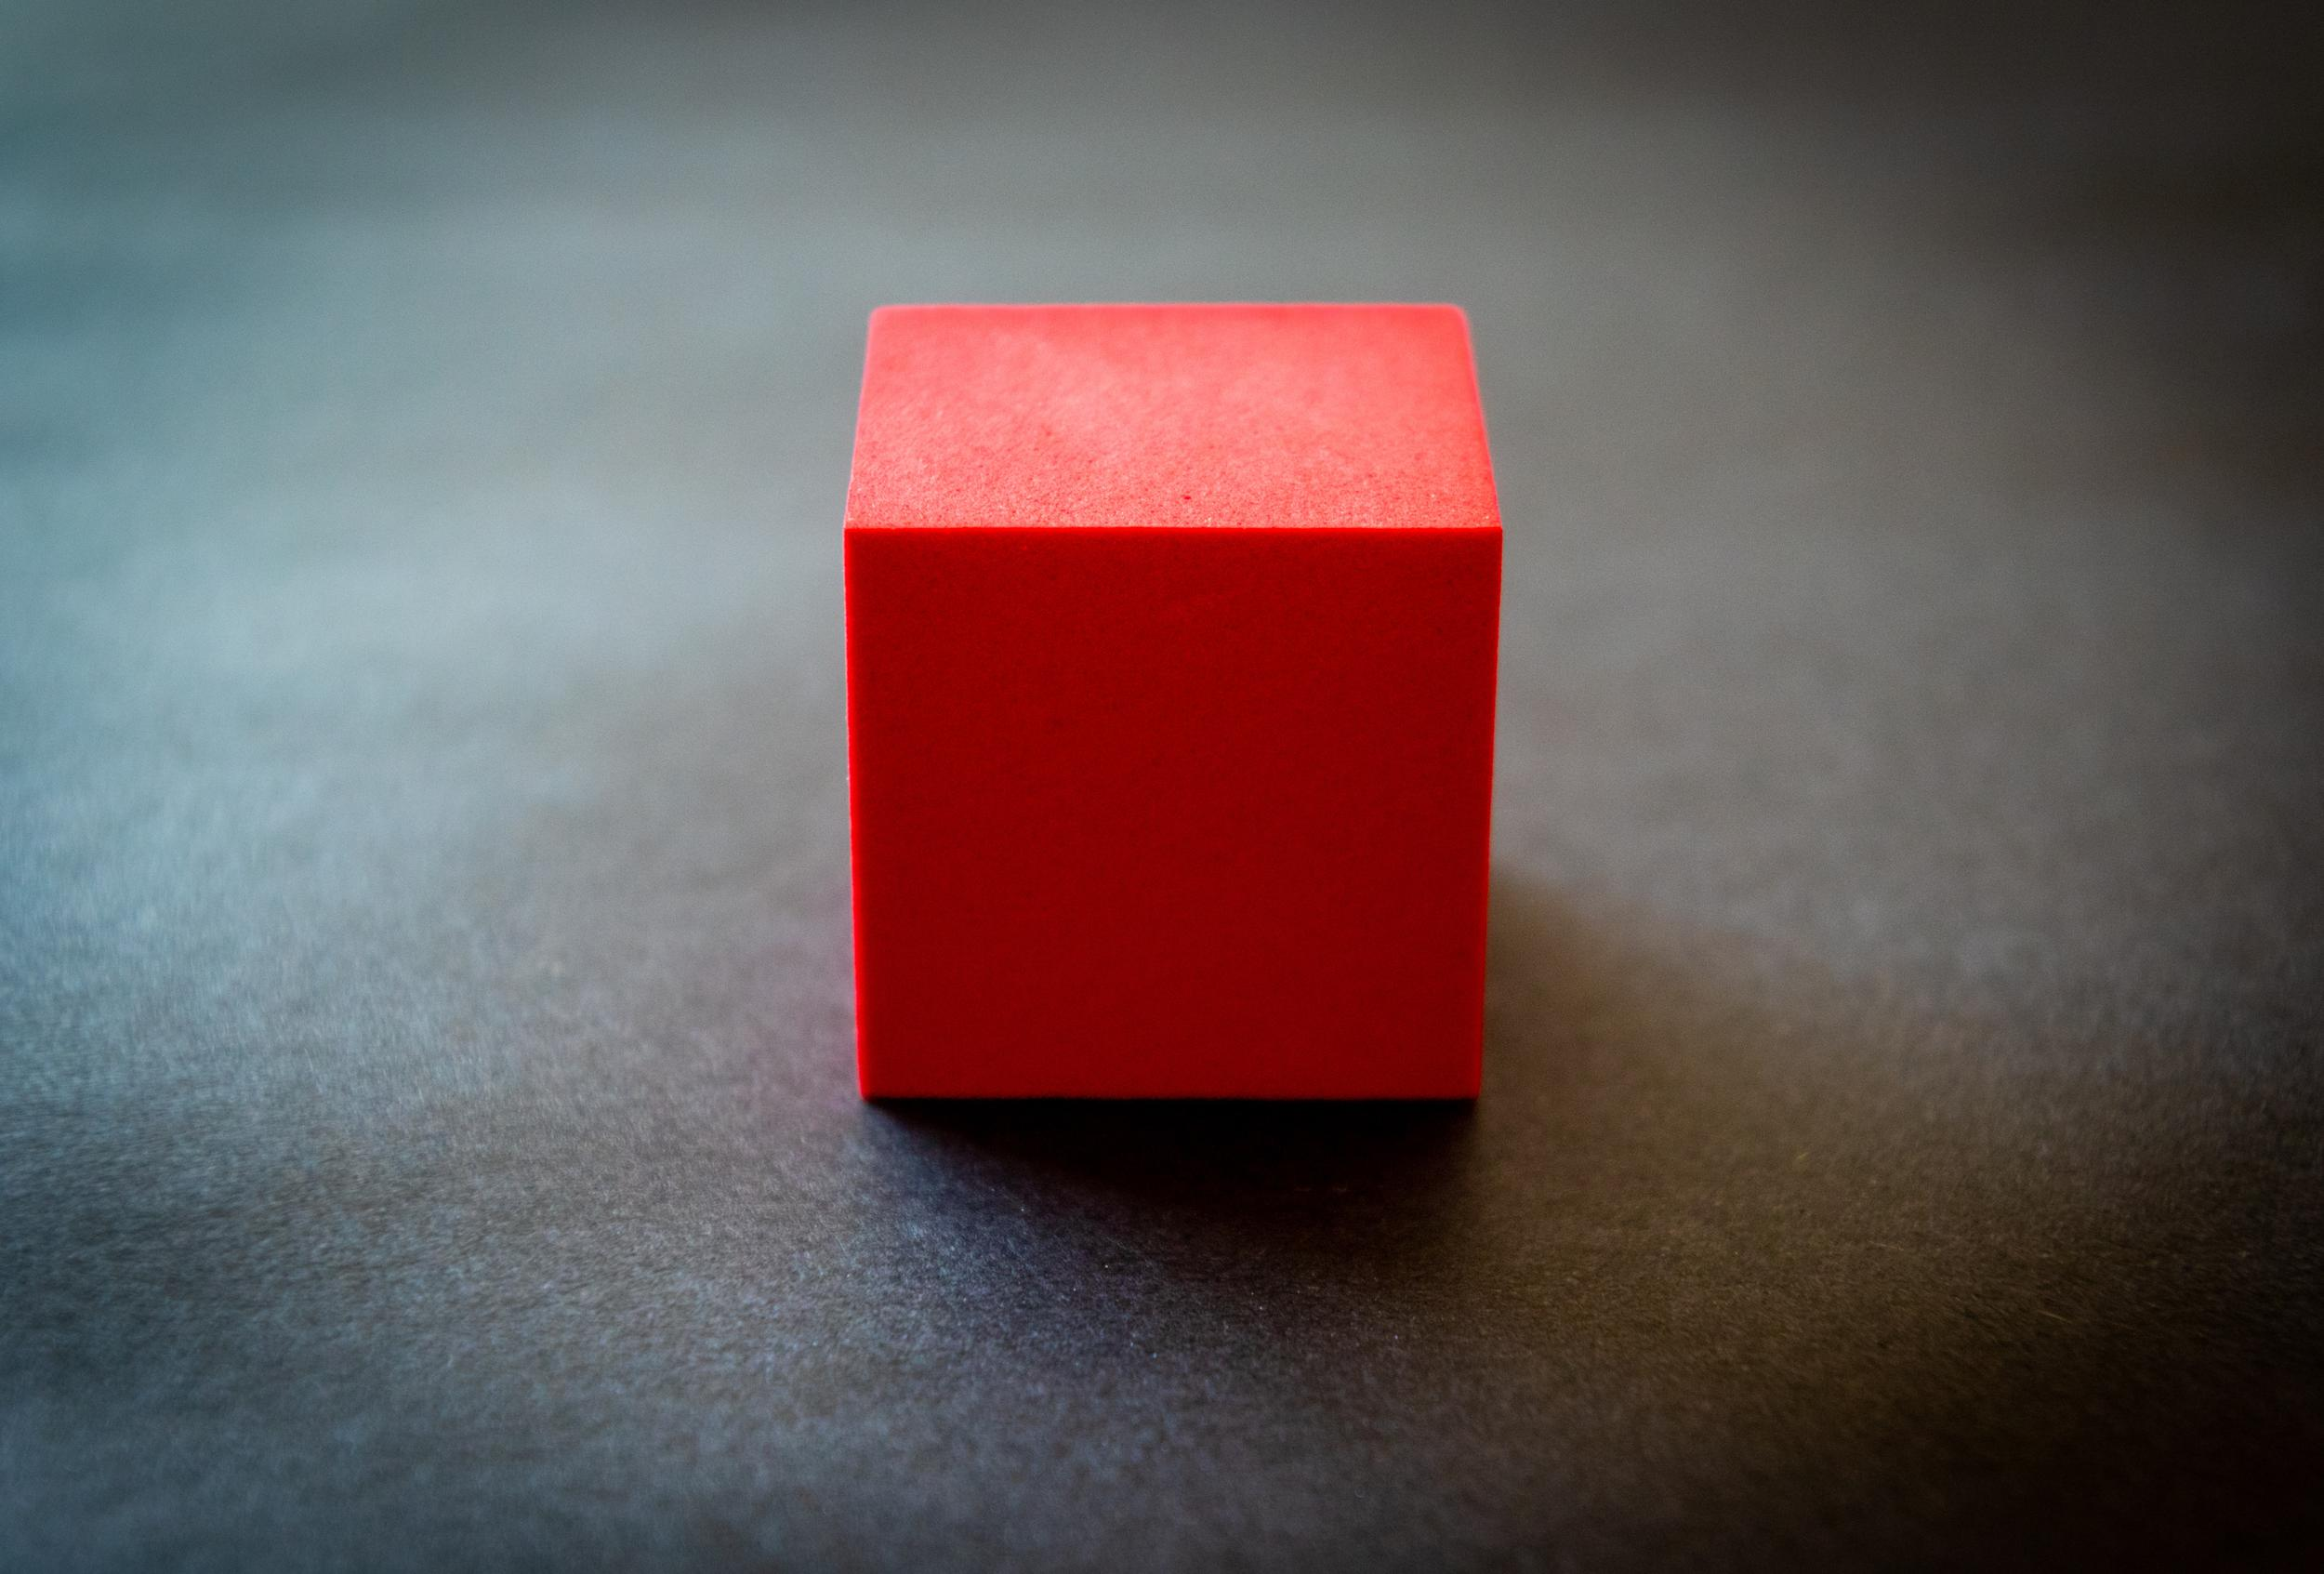 red-cube-1340189.jpg